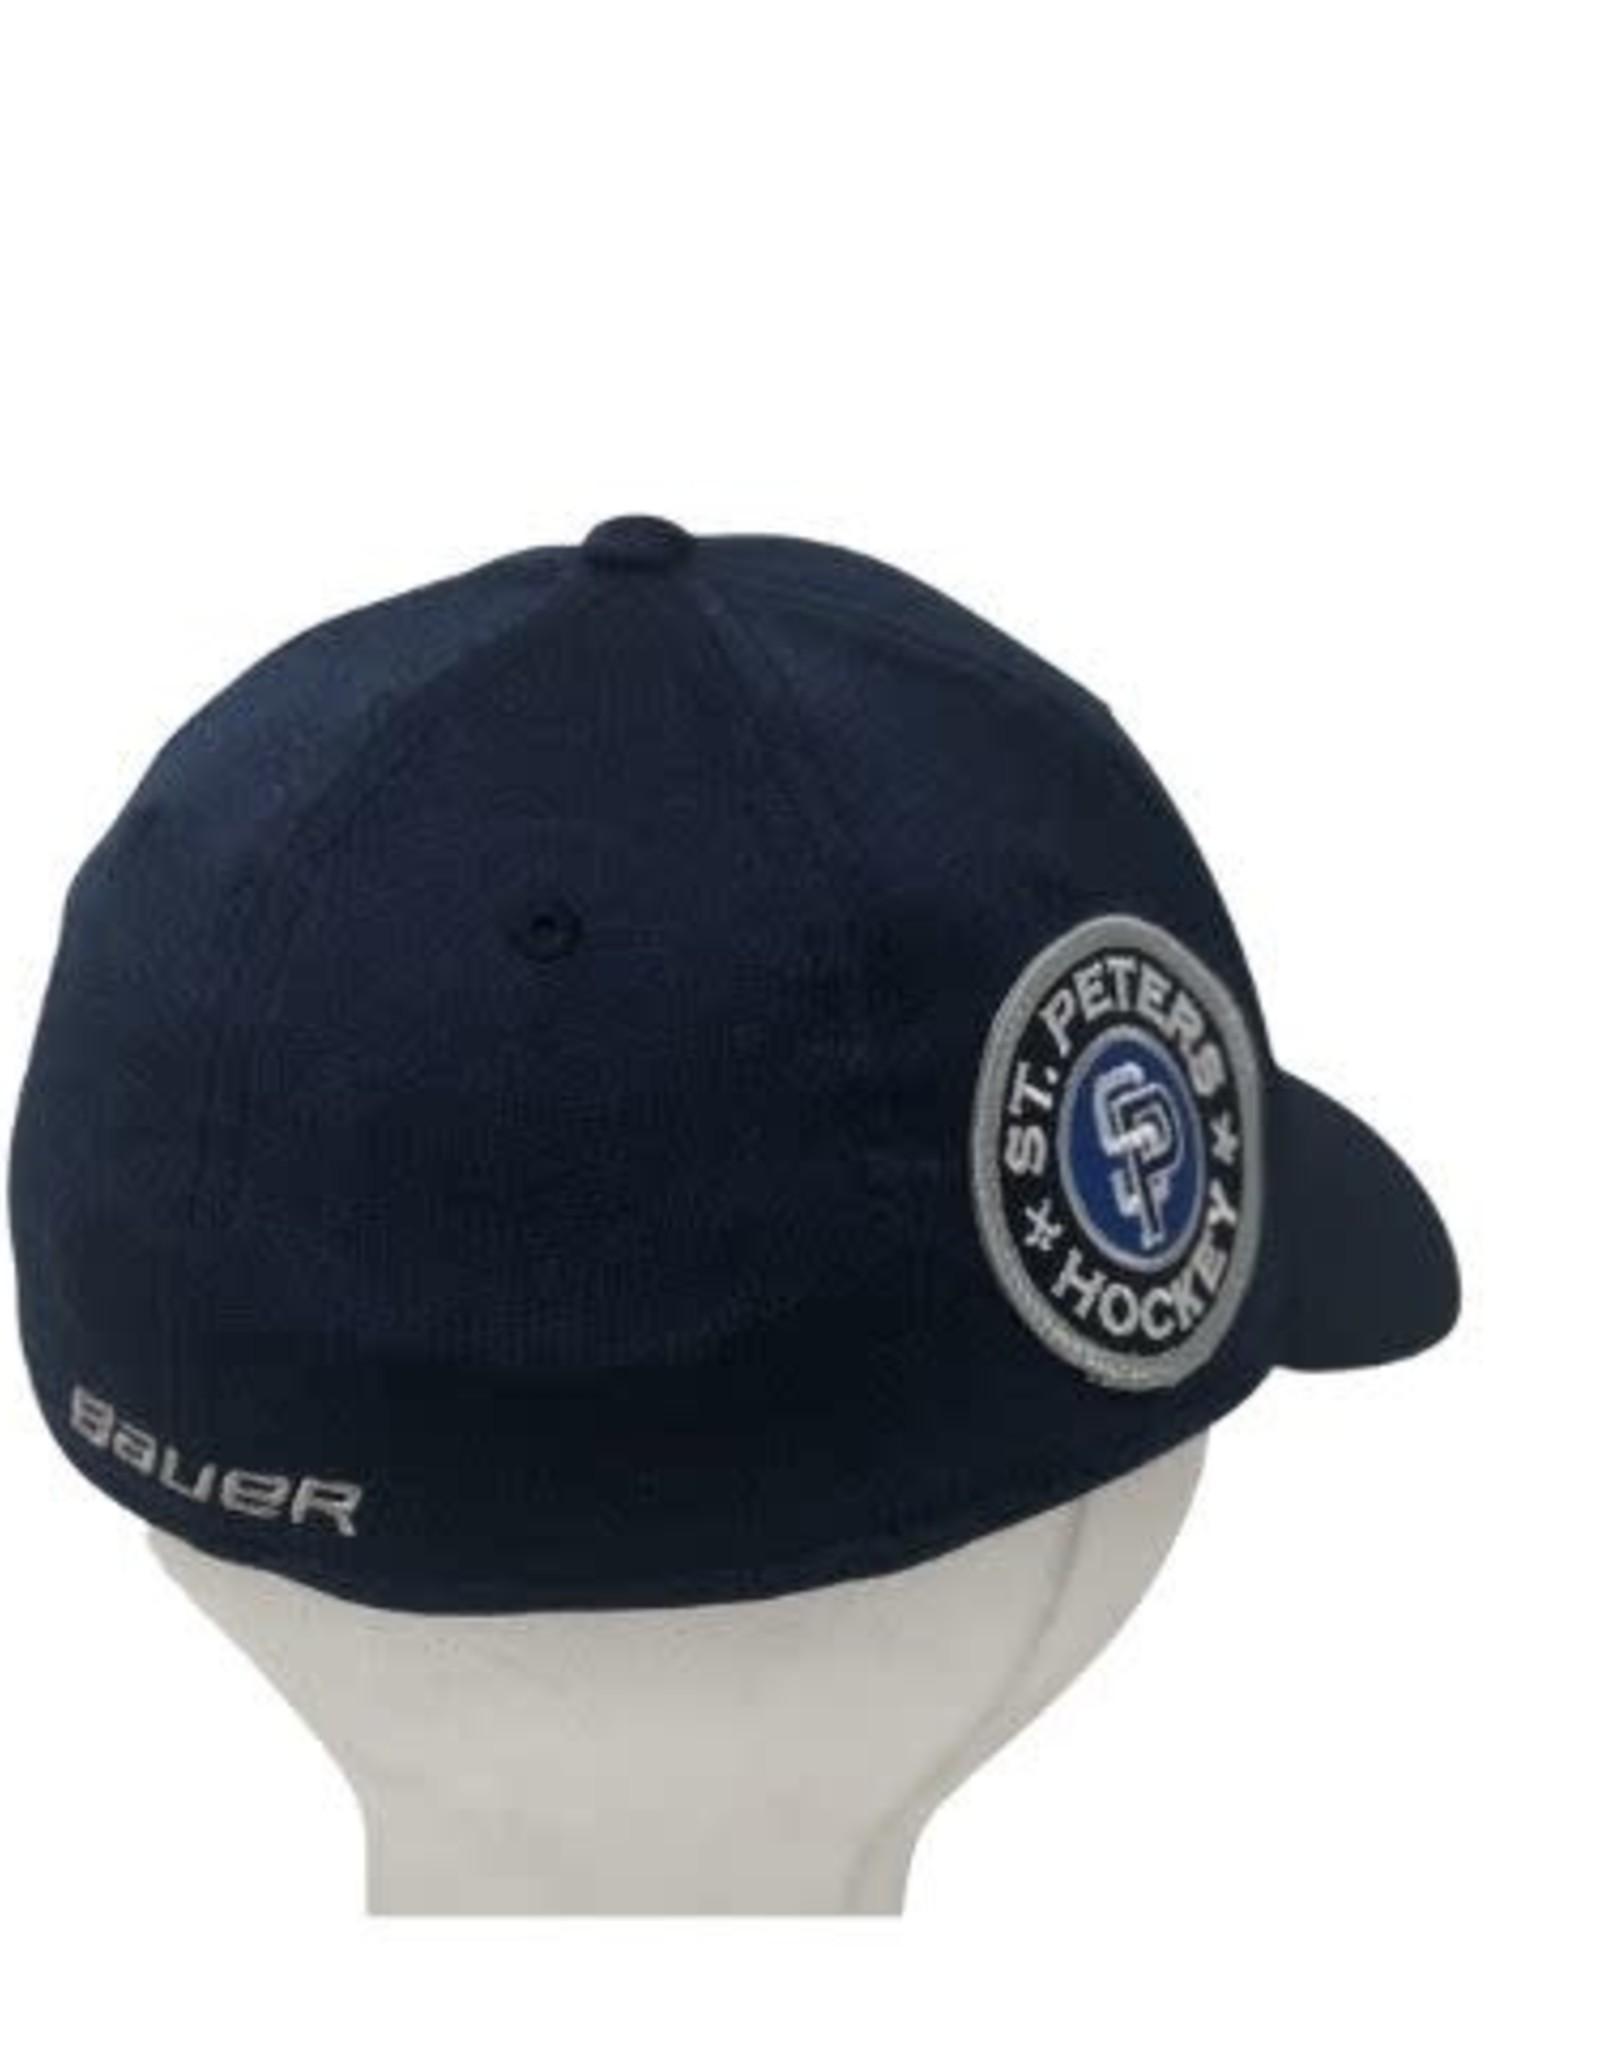 TGP Services STP Bauer 3930 Hat (SM/MD) Navy